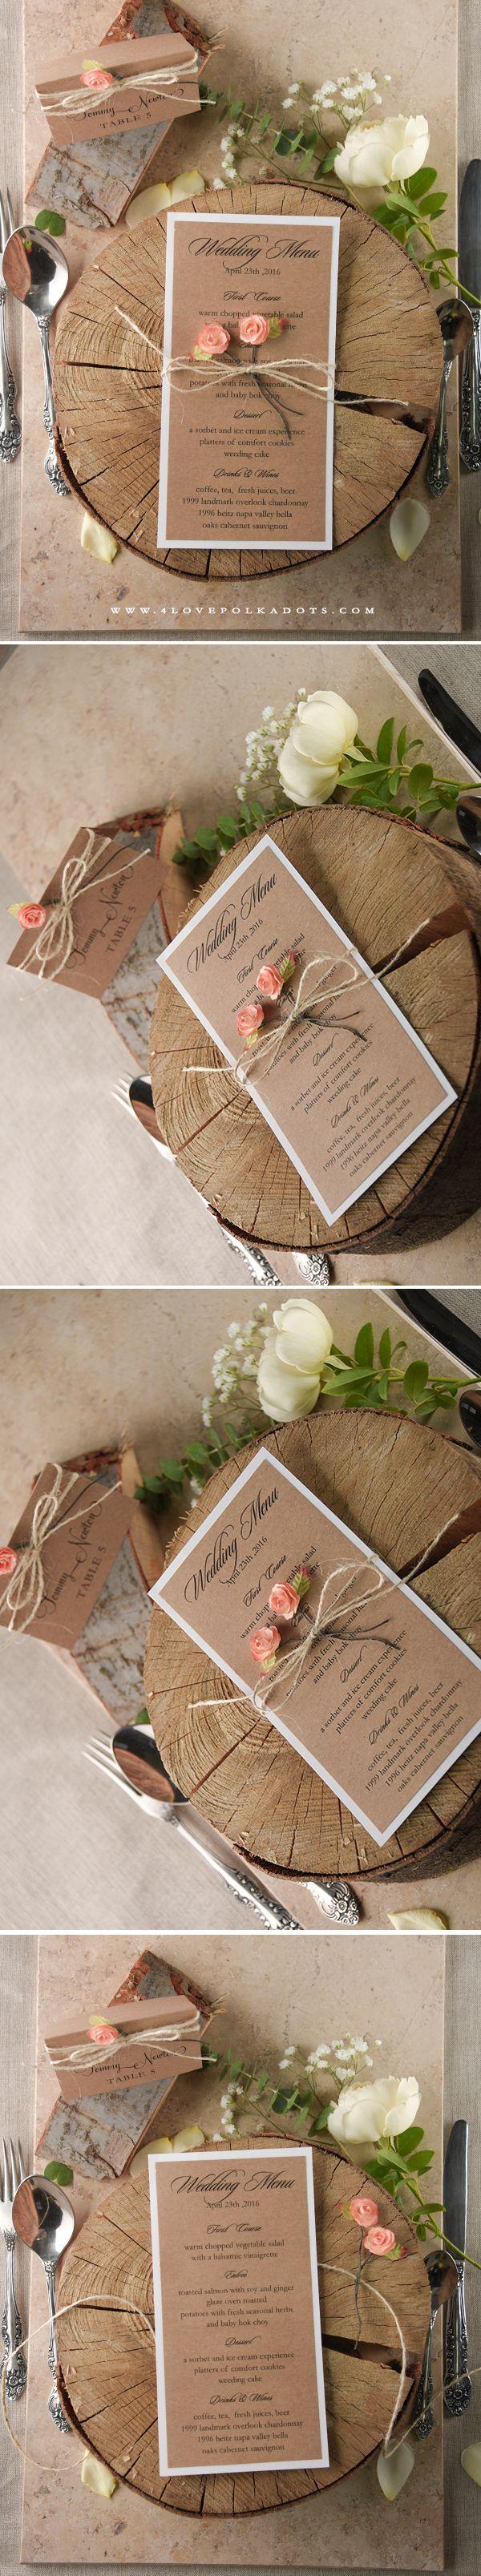 Romantic Rustic Wedding Menu Card #weddingideas #romantic #woodlandwedding #fairytale #roses